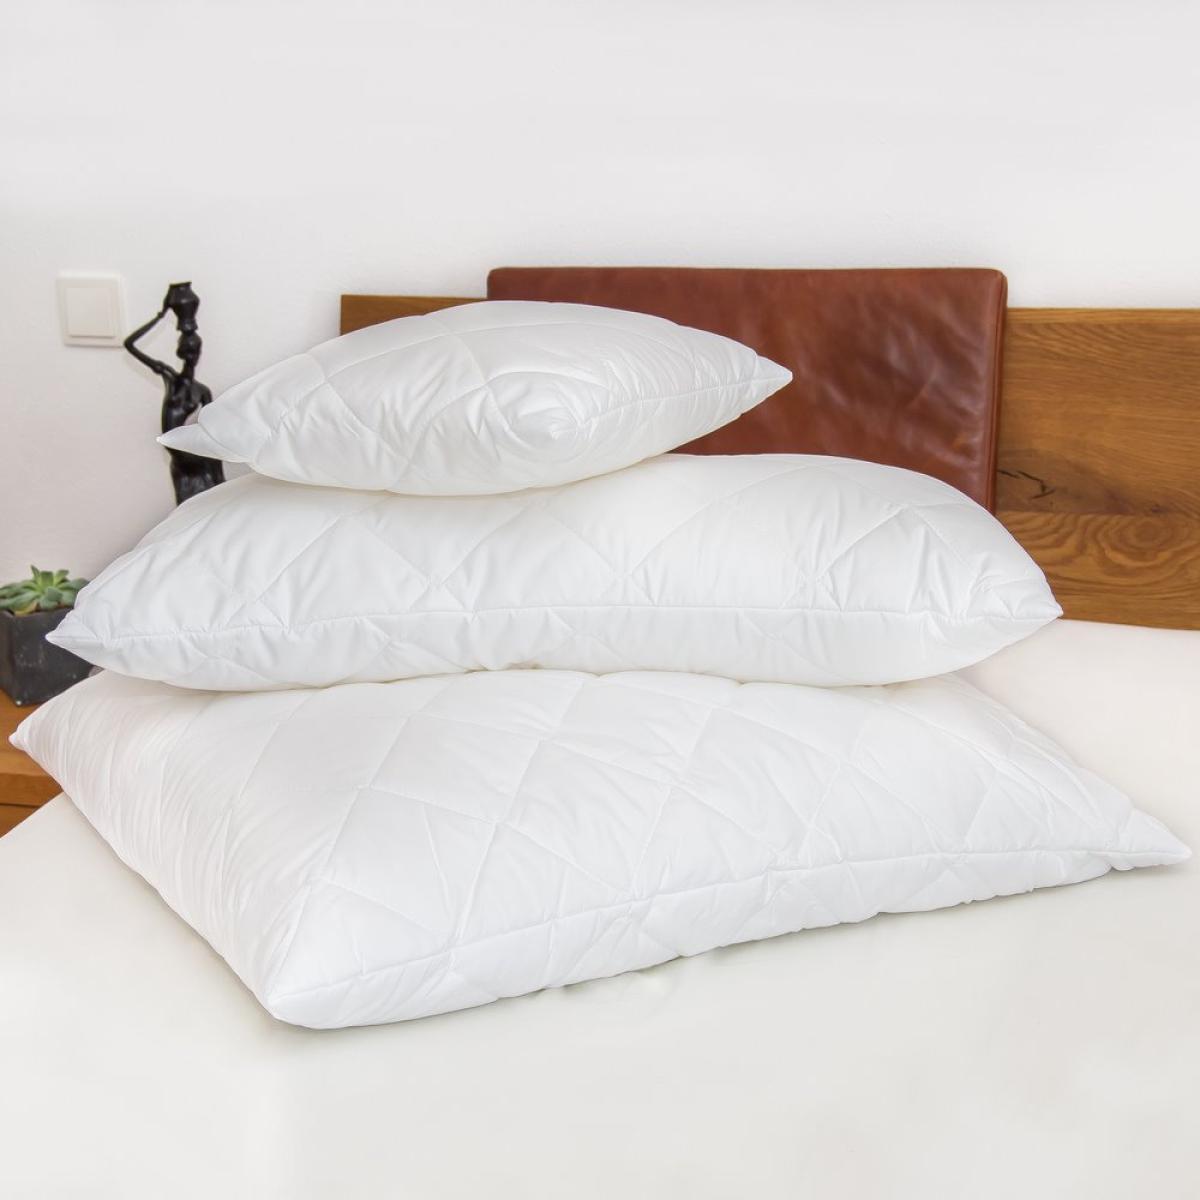 sofa kissen fritzchen dacron 95 40 x 40 cm kochfest. Black Bedroom Furniture Sets. Home Design Ideas